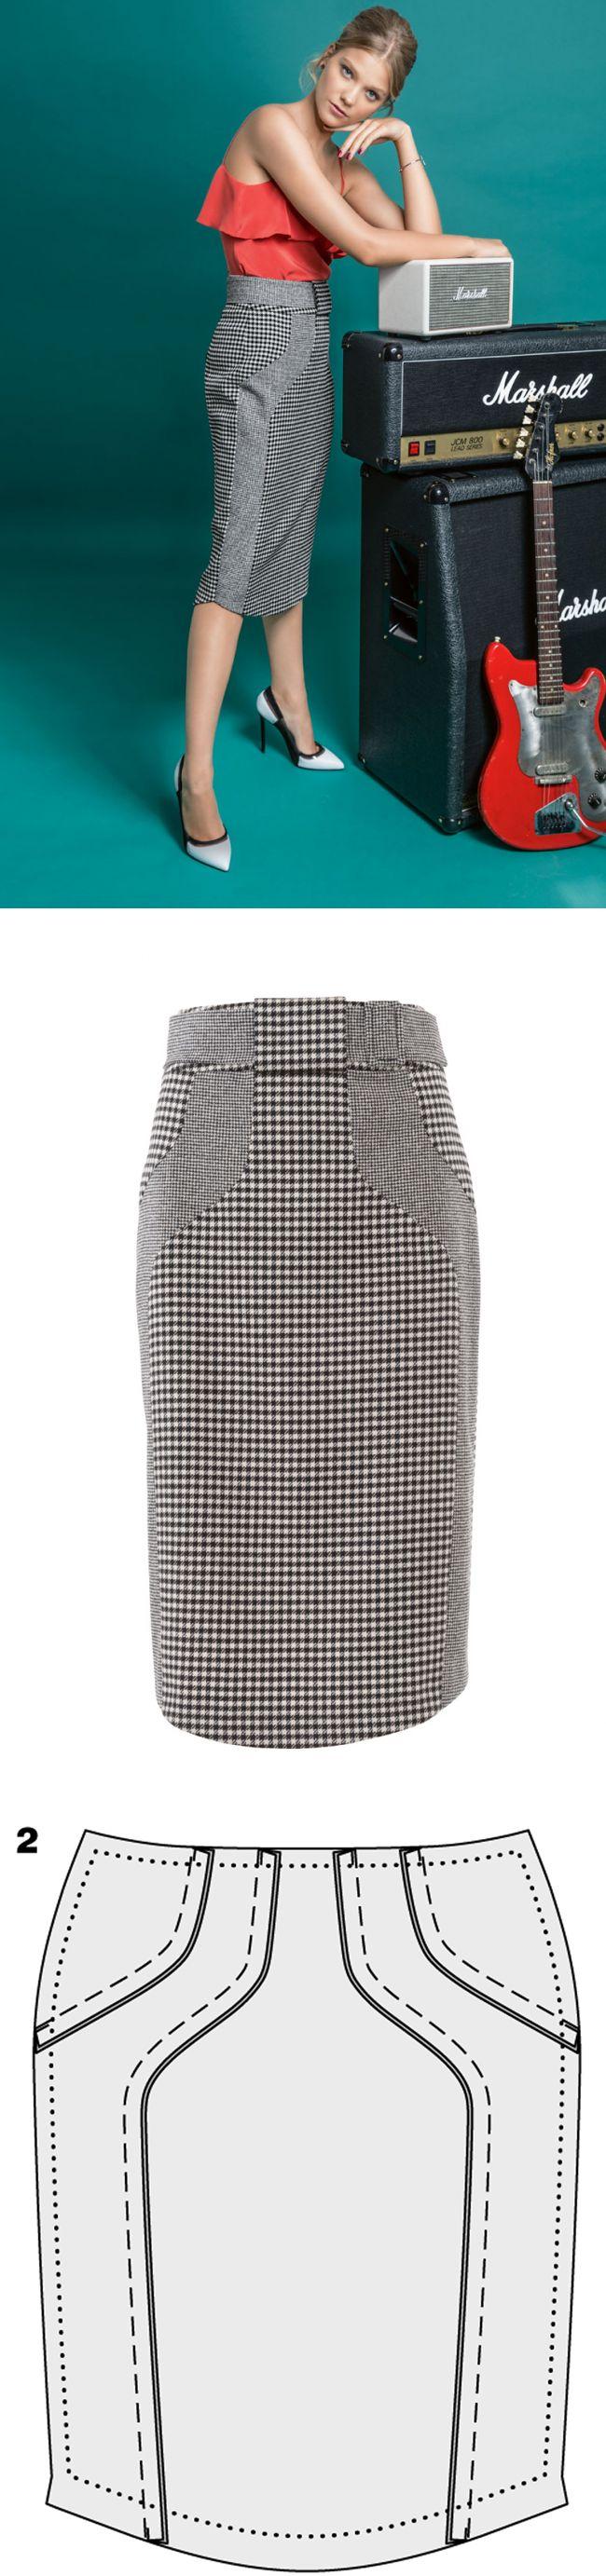 How to sew a pencil skirt with a high waist...♥ Deniz ♥